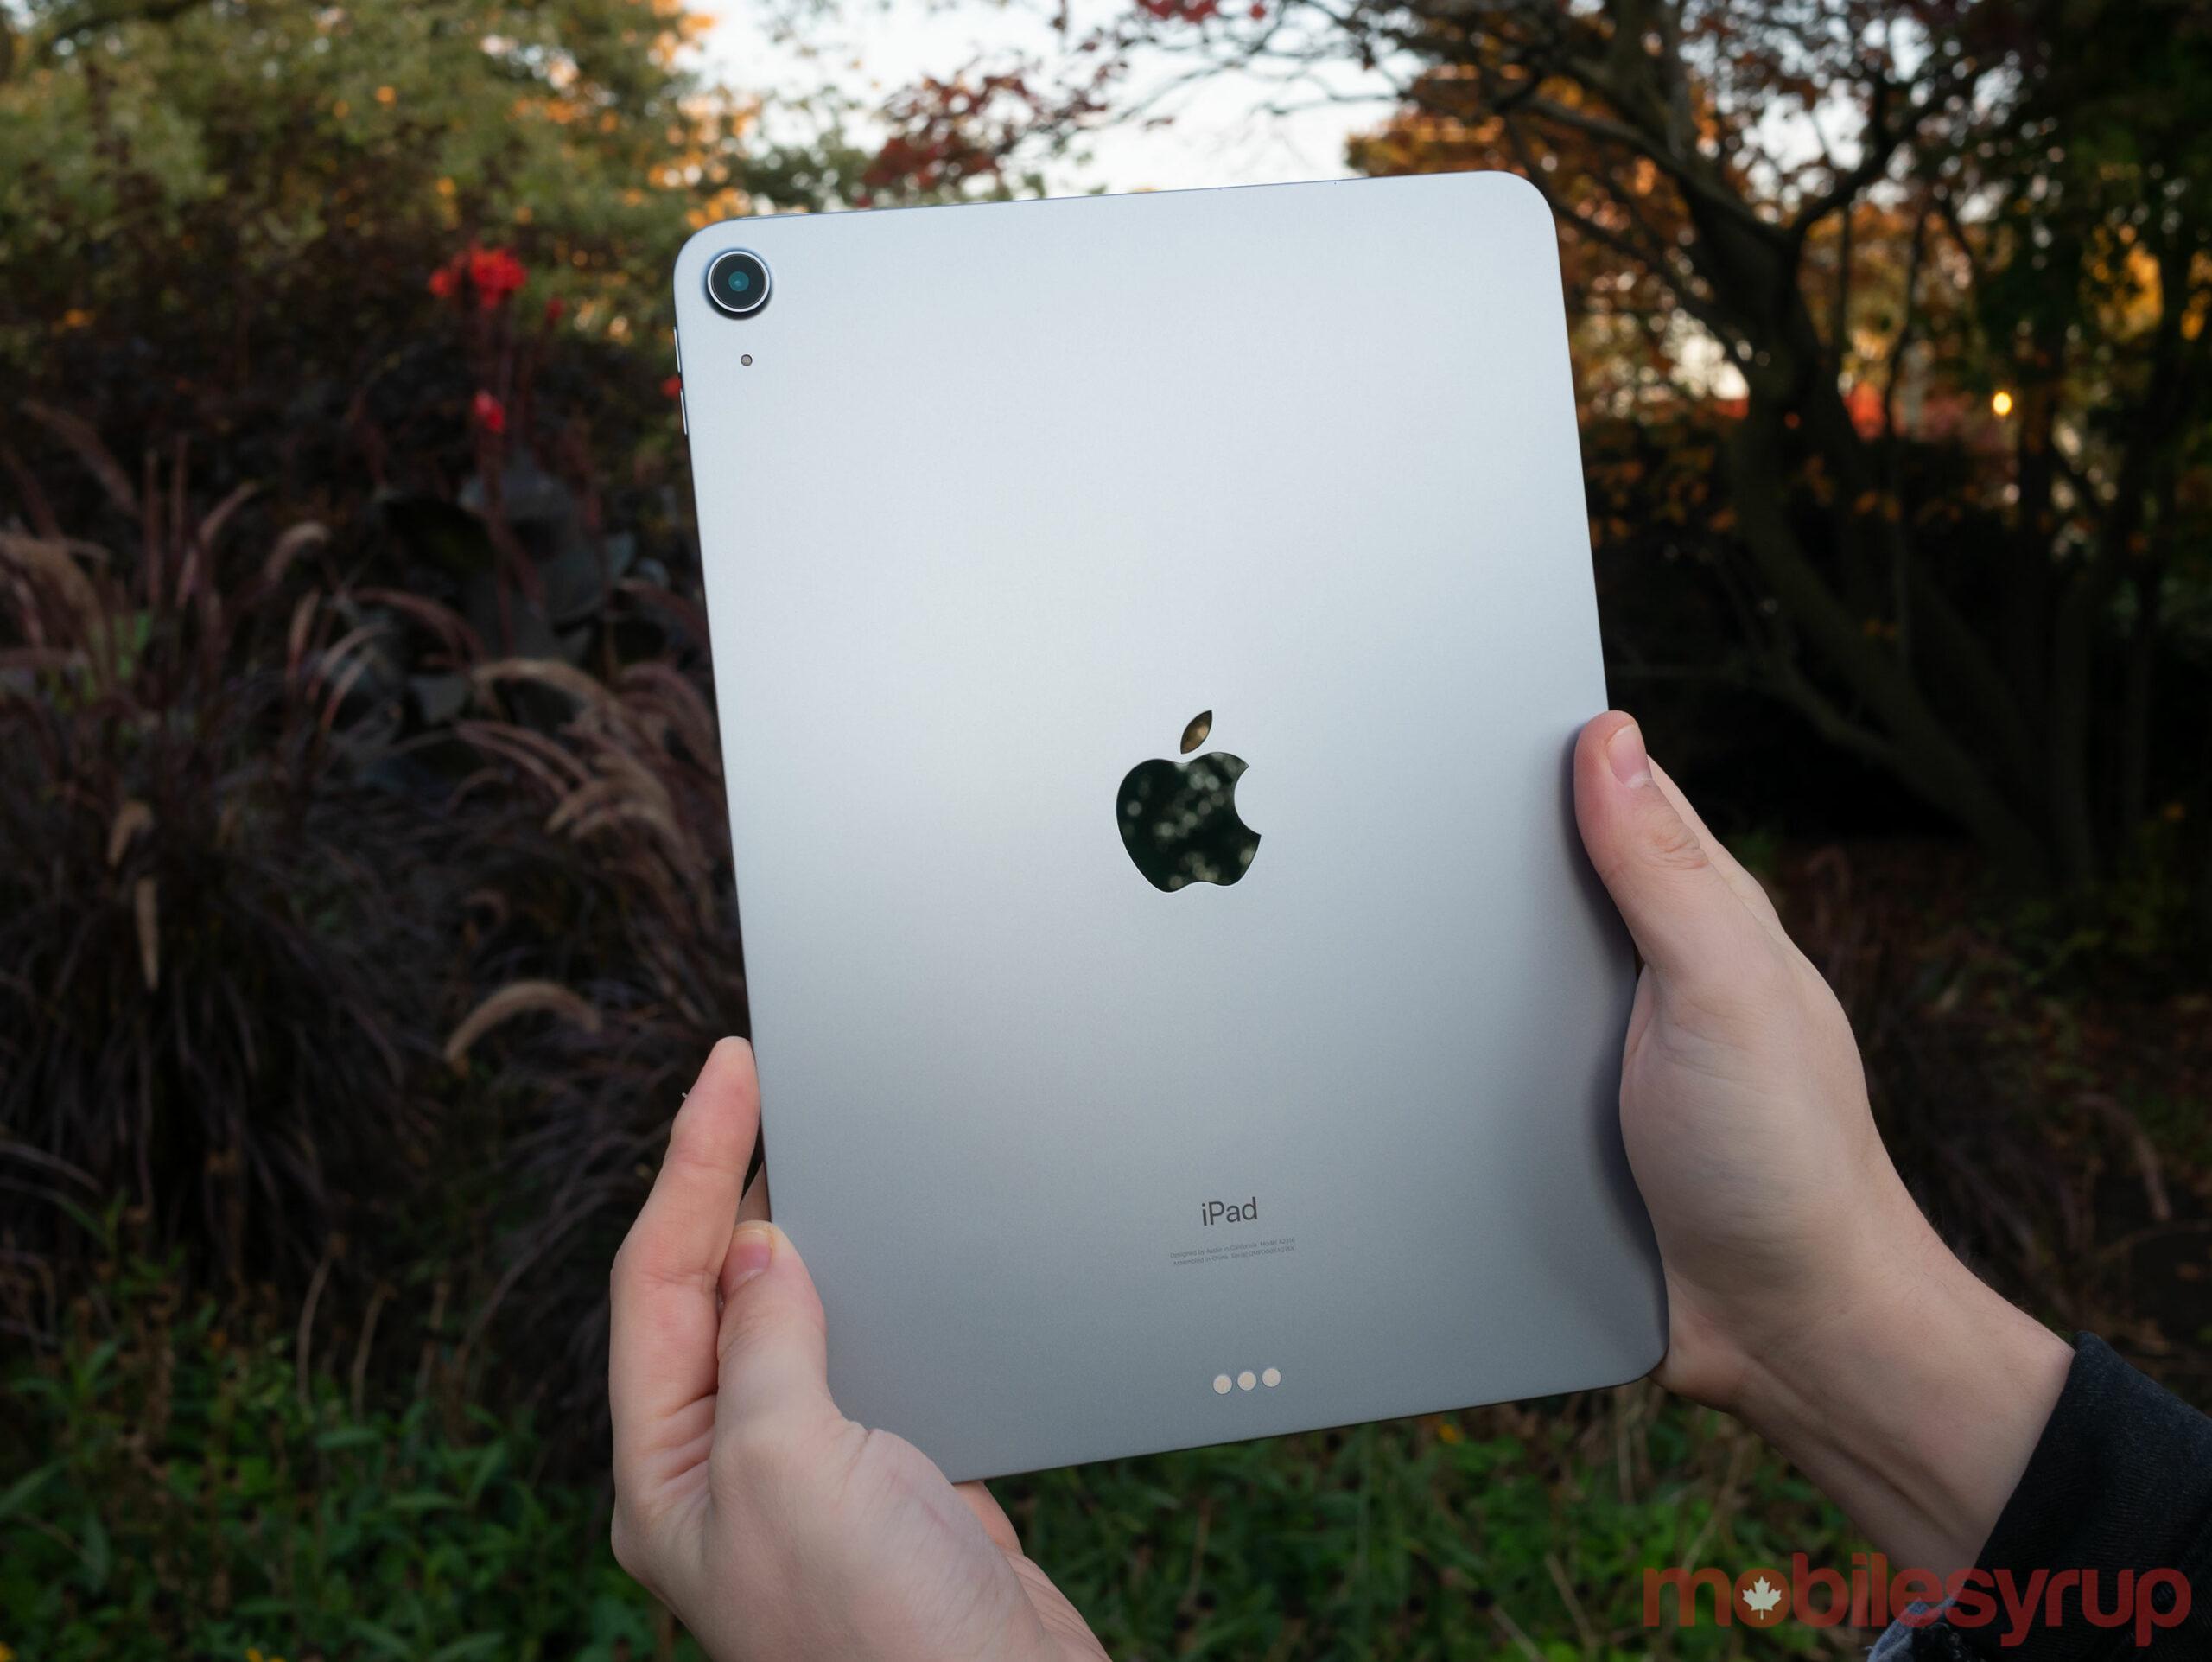 iPad Air (2020) back